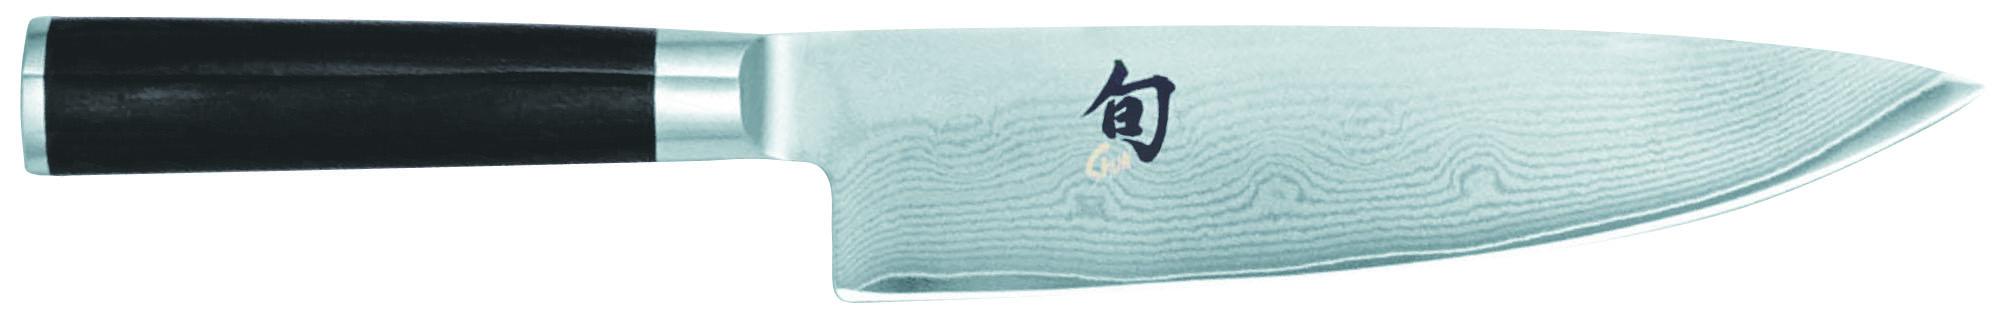 Kai Shun Classic DM-0706 Kockkniv 205 cm